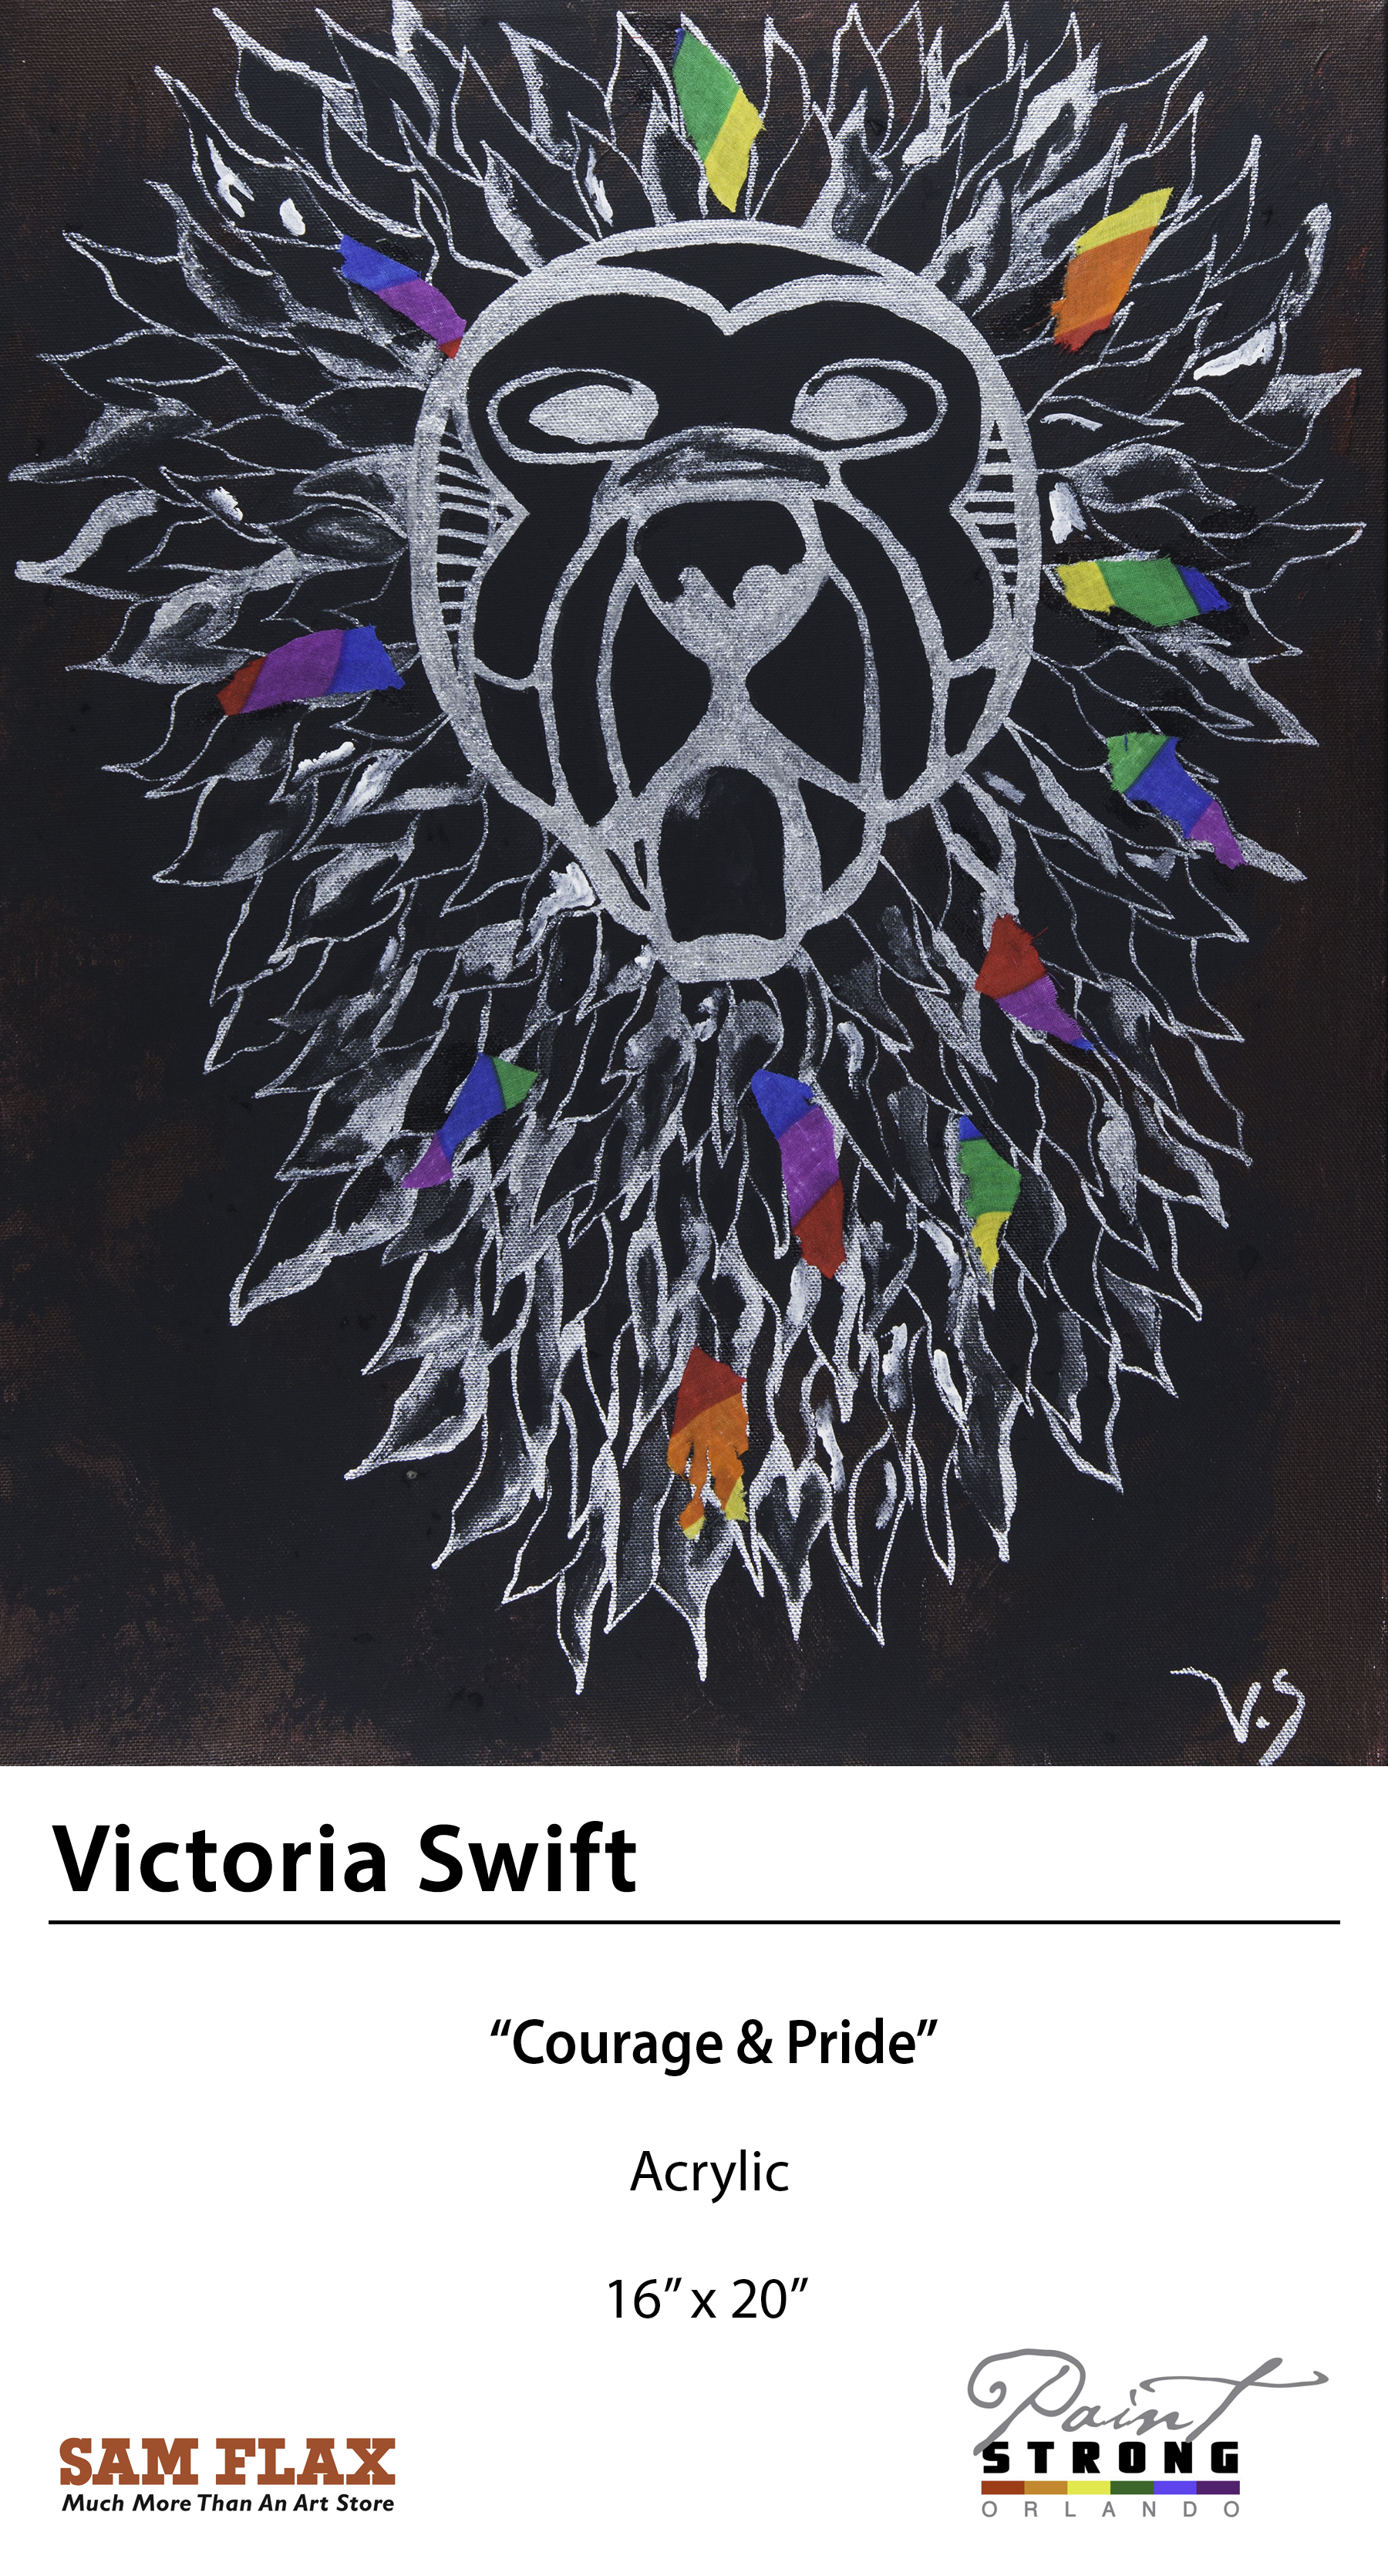 Victoria Swift